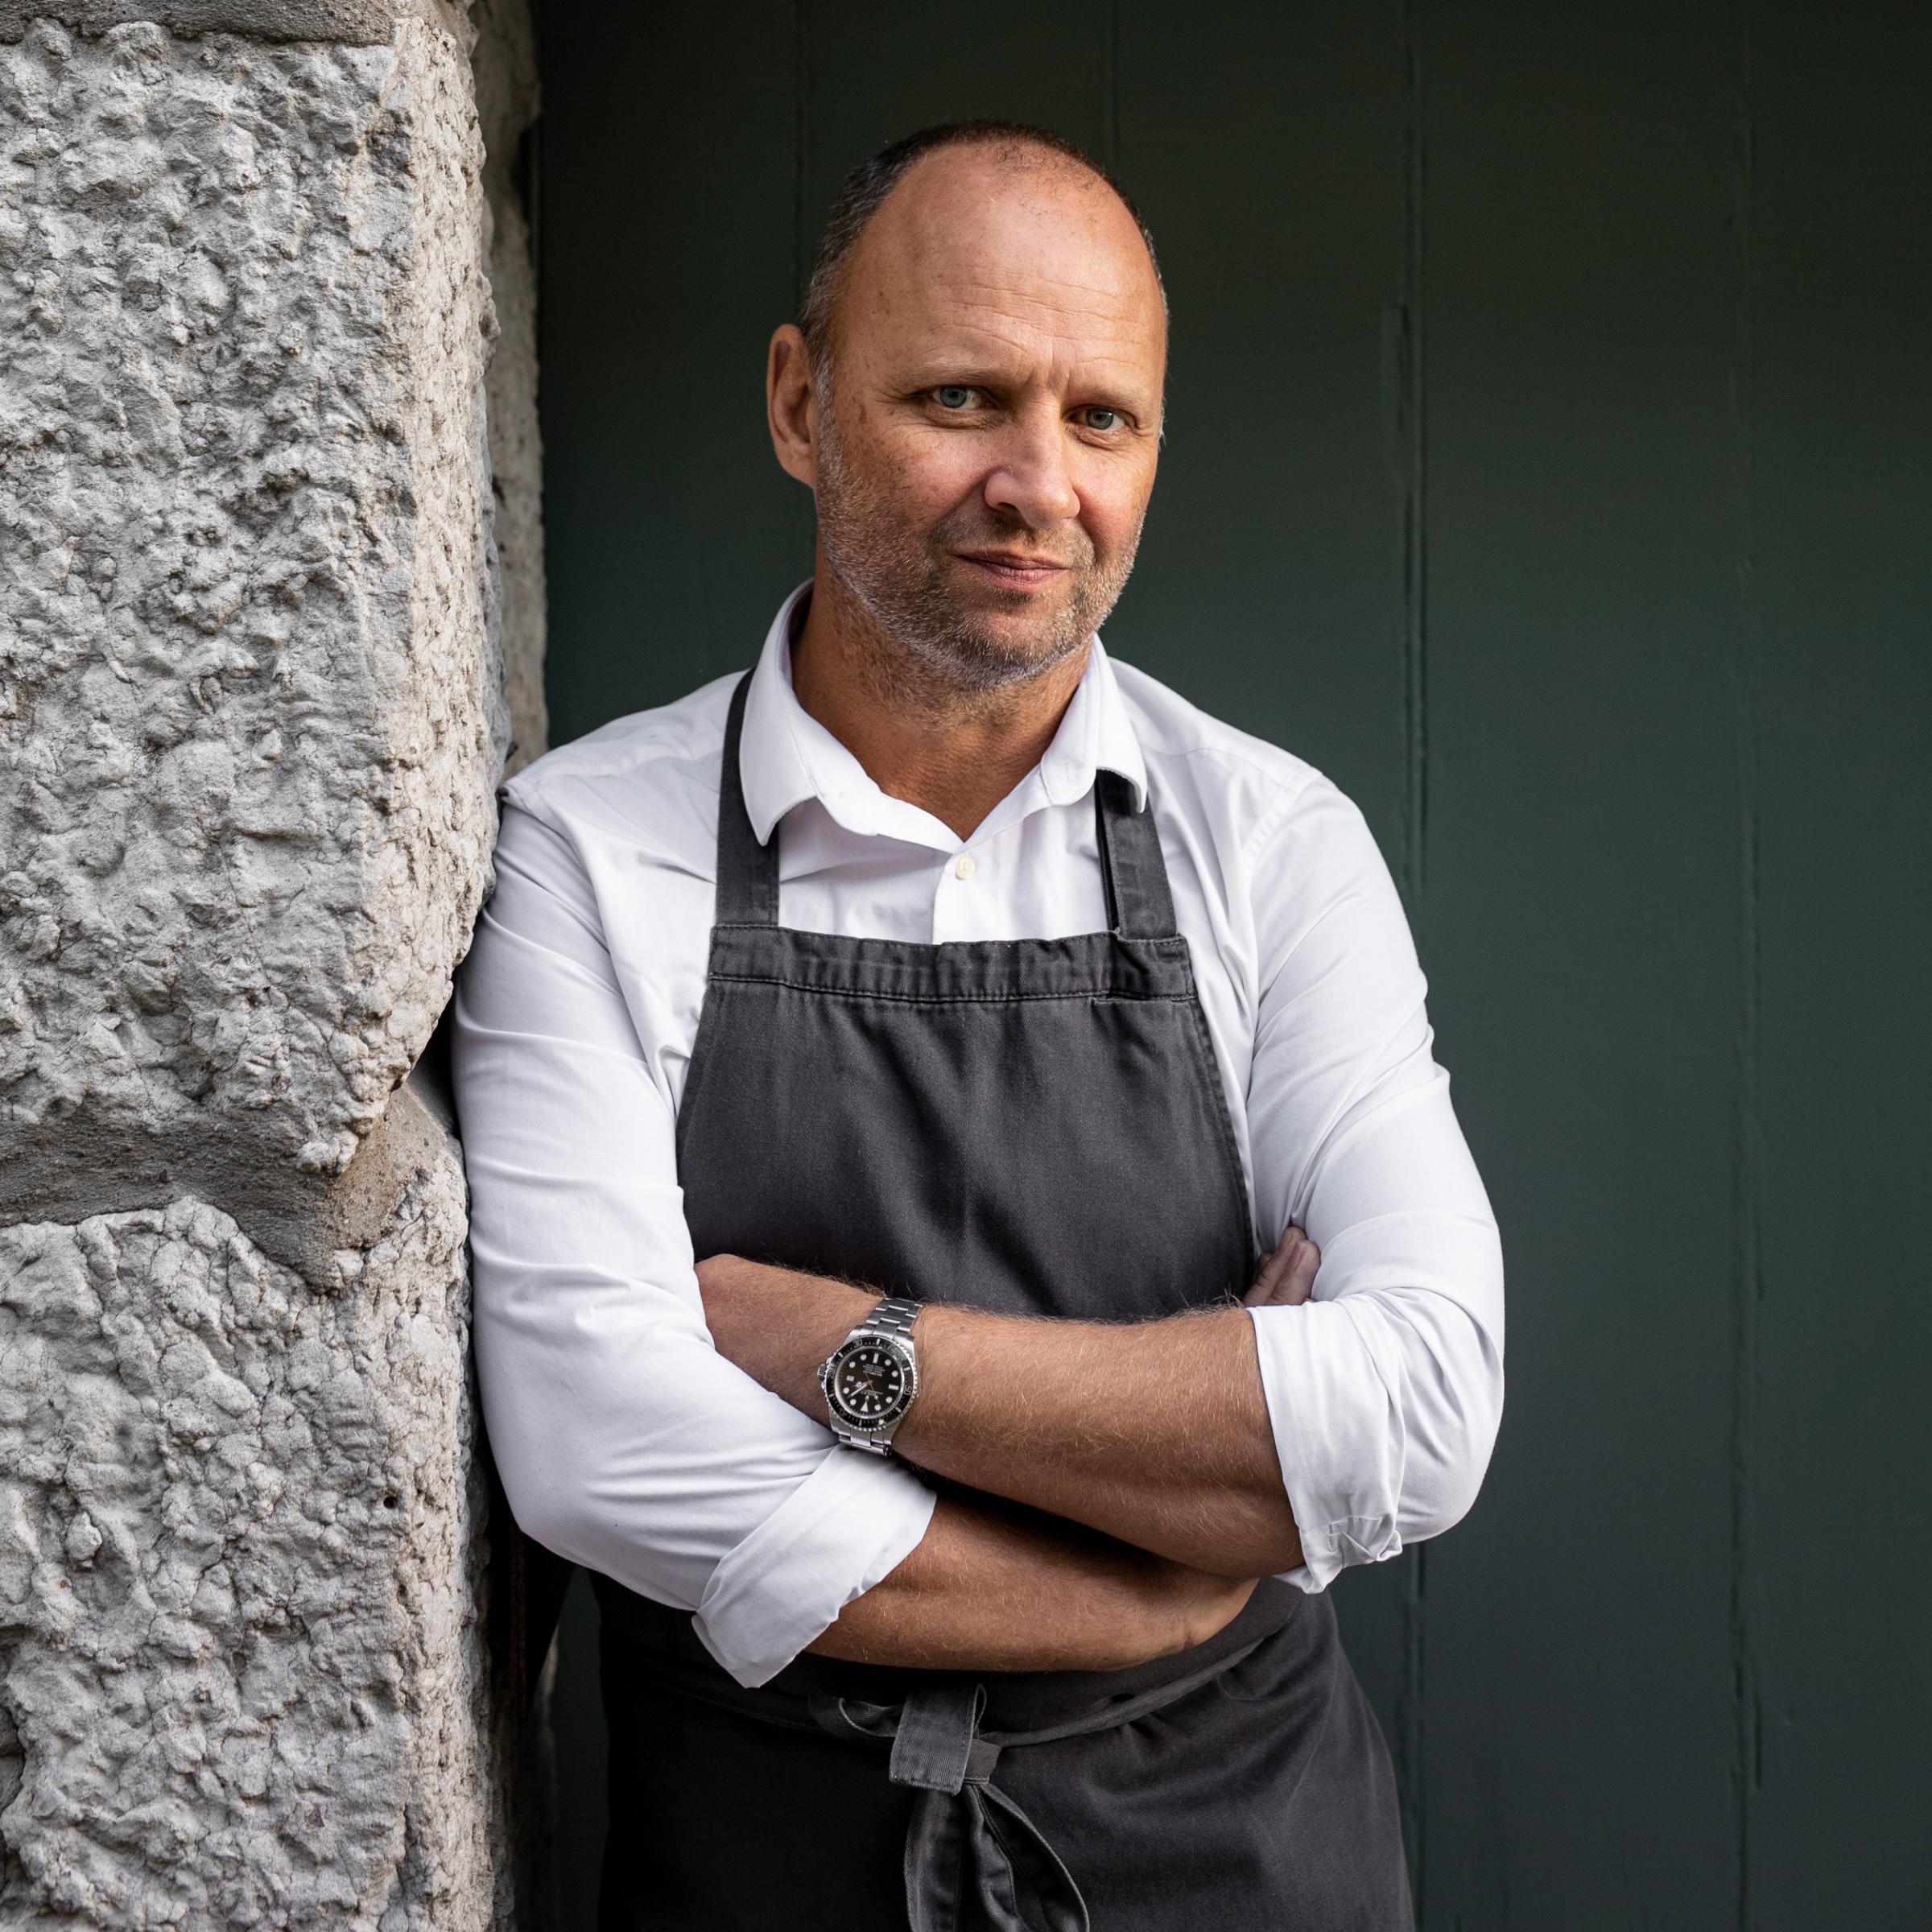 Simon Rogan to open Henrock at Linthwaite House hotel